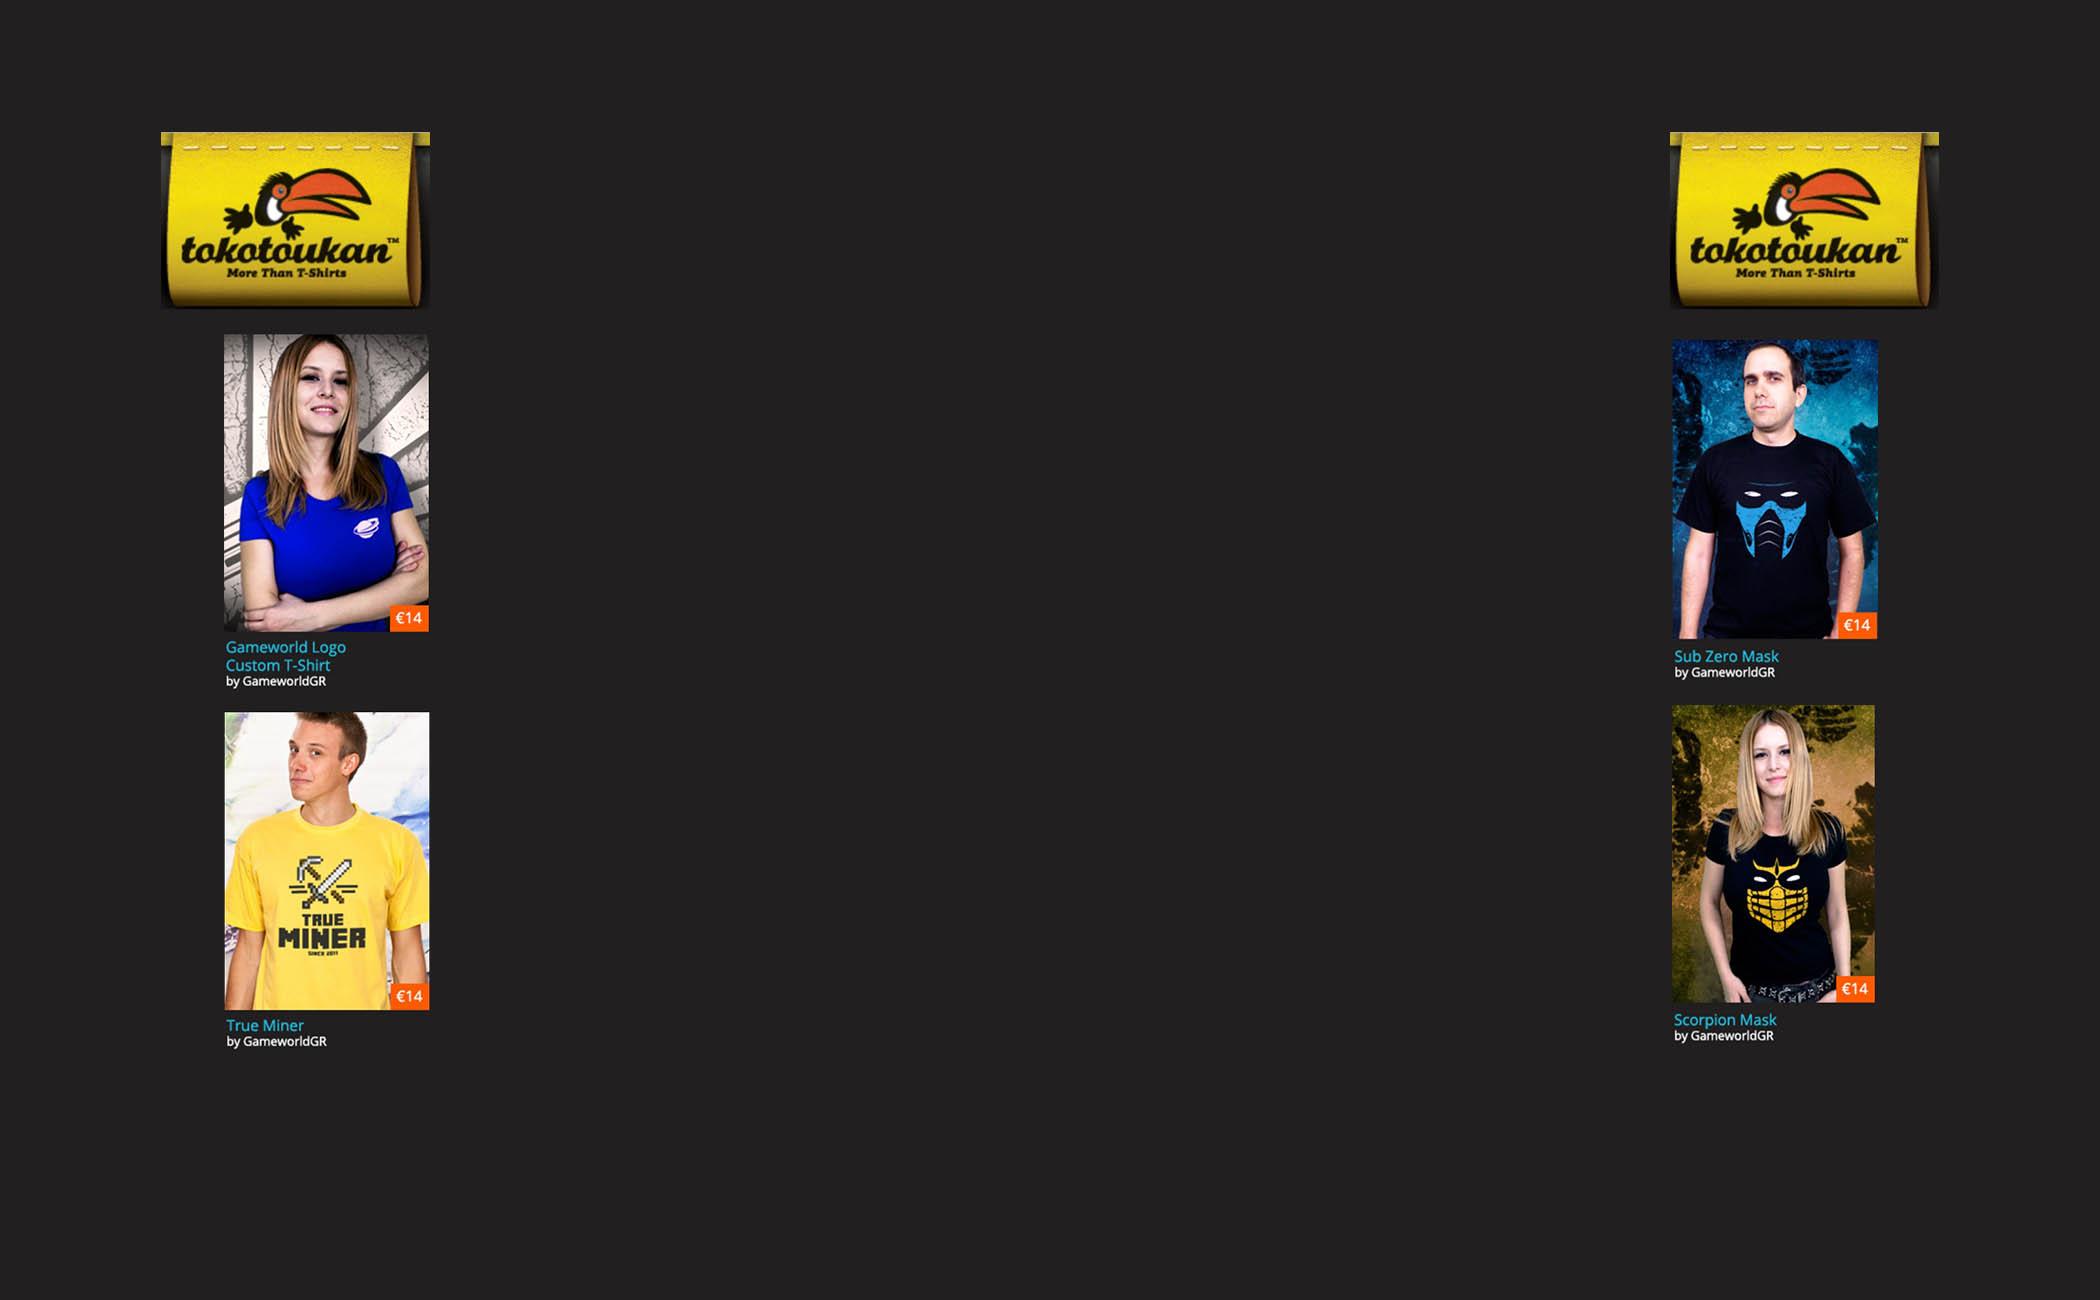 Background Skin Ad (TokoToukan)